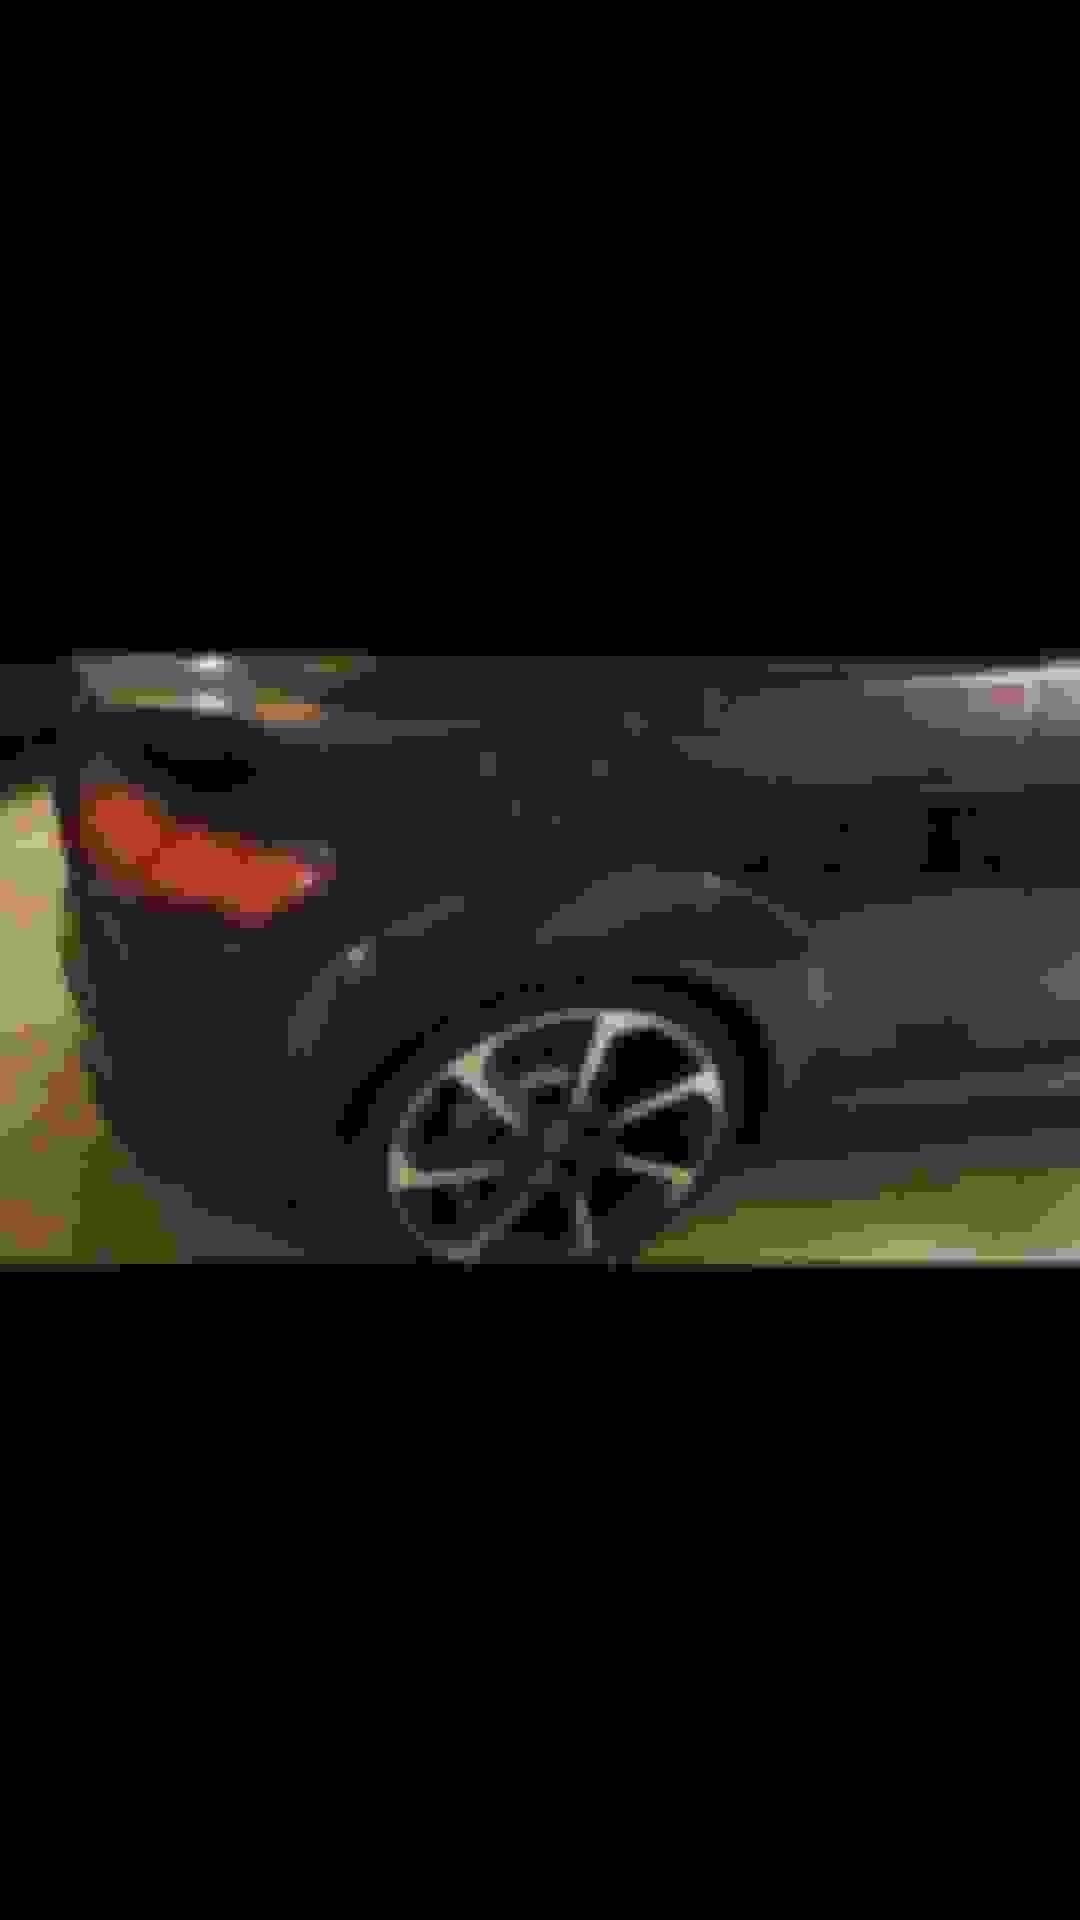 Black badges, rings & fuel door installed - AudiWorld Forums